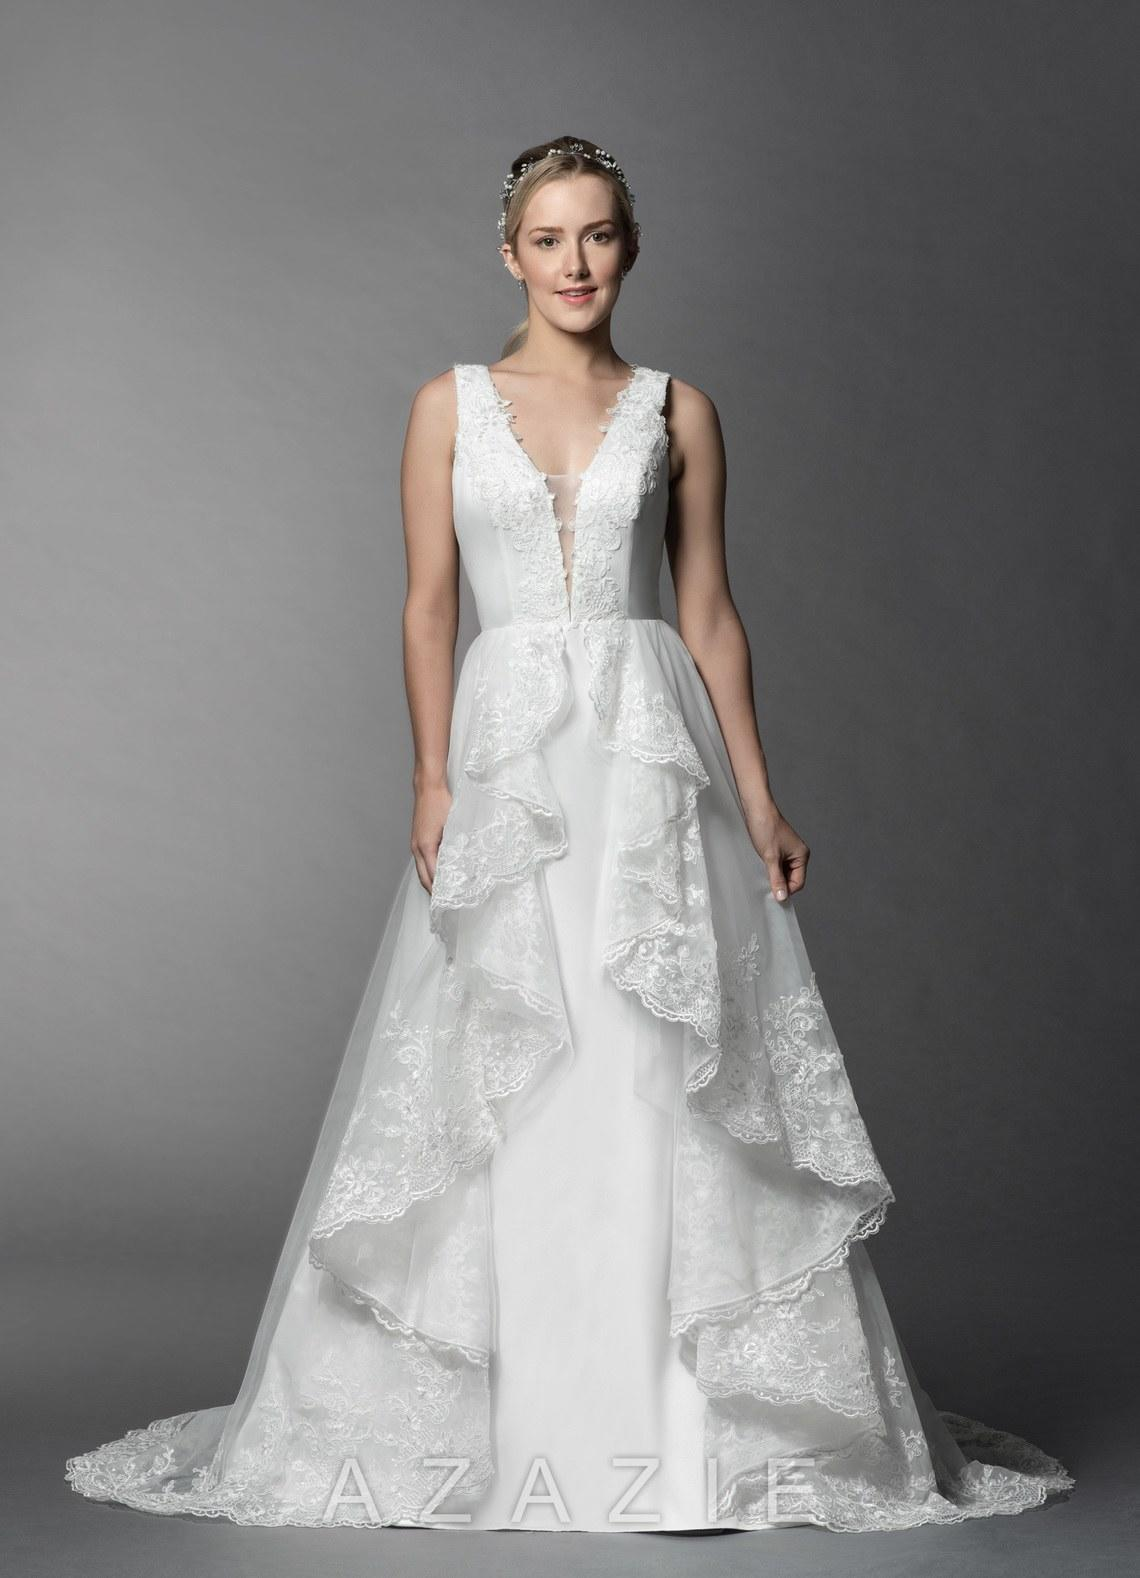 4ac8d3c63d 65 Plunging Neckline Wedding Dresses For The Daring Bride